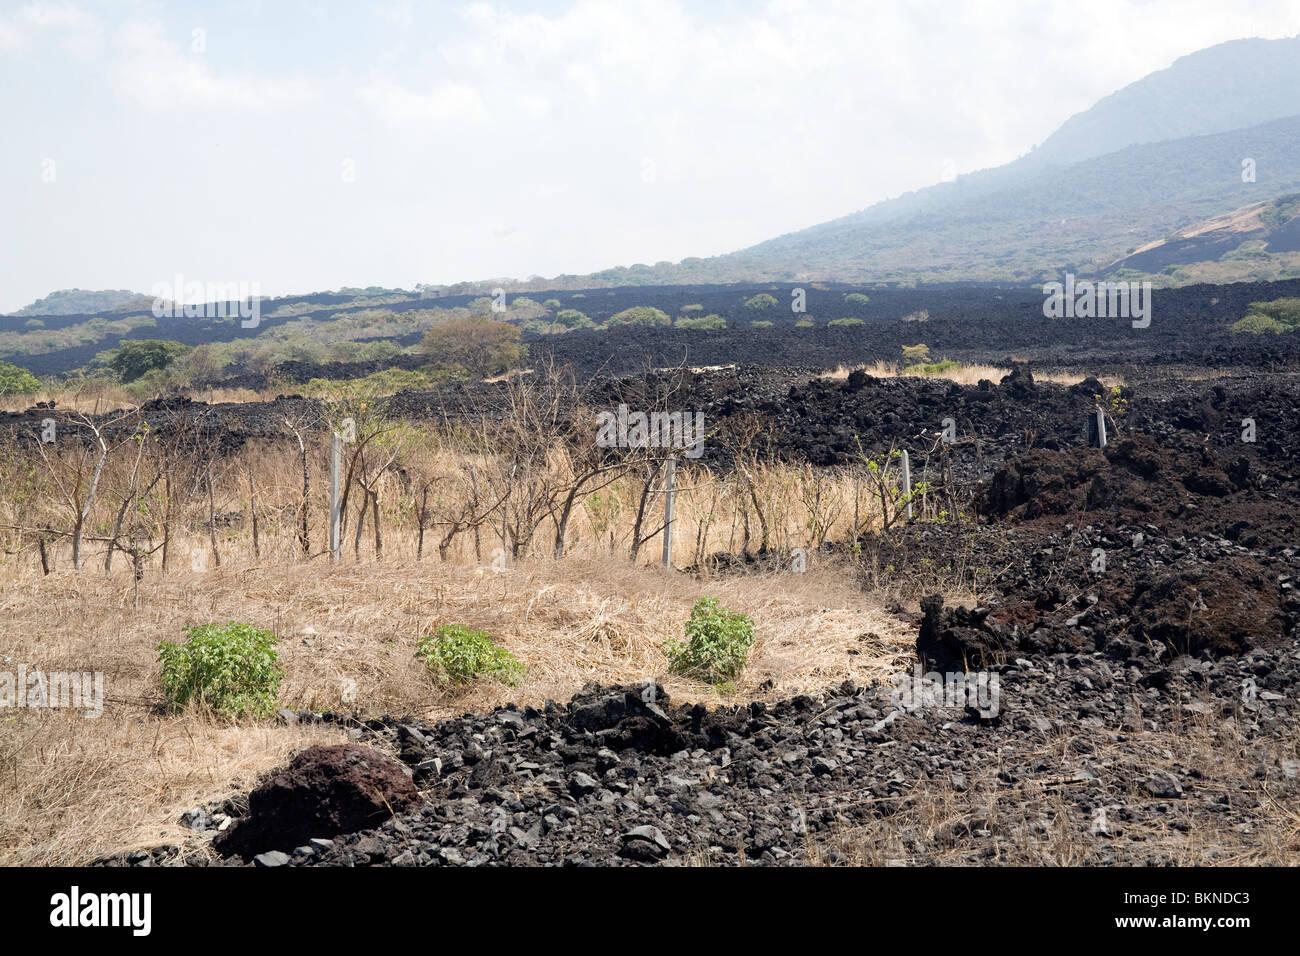 The lava field from the last eruption of Ilopango Volcano, El Salvador - Stock Image